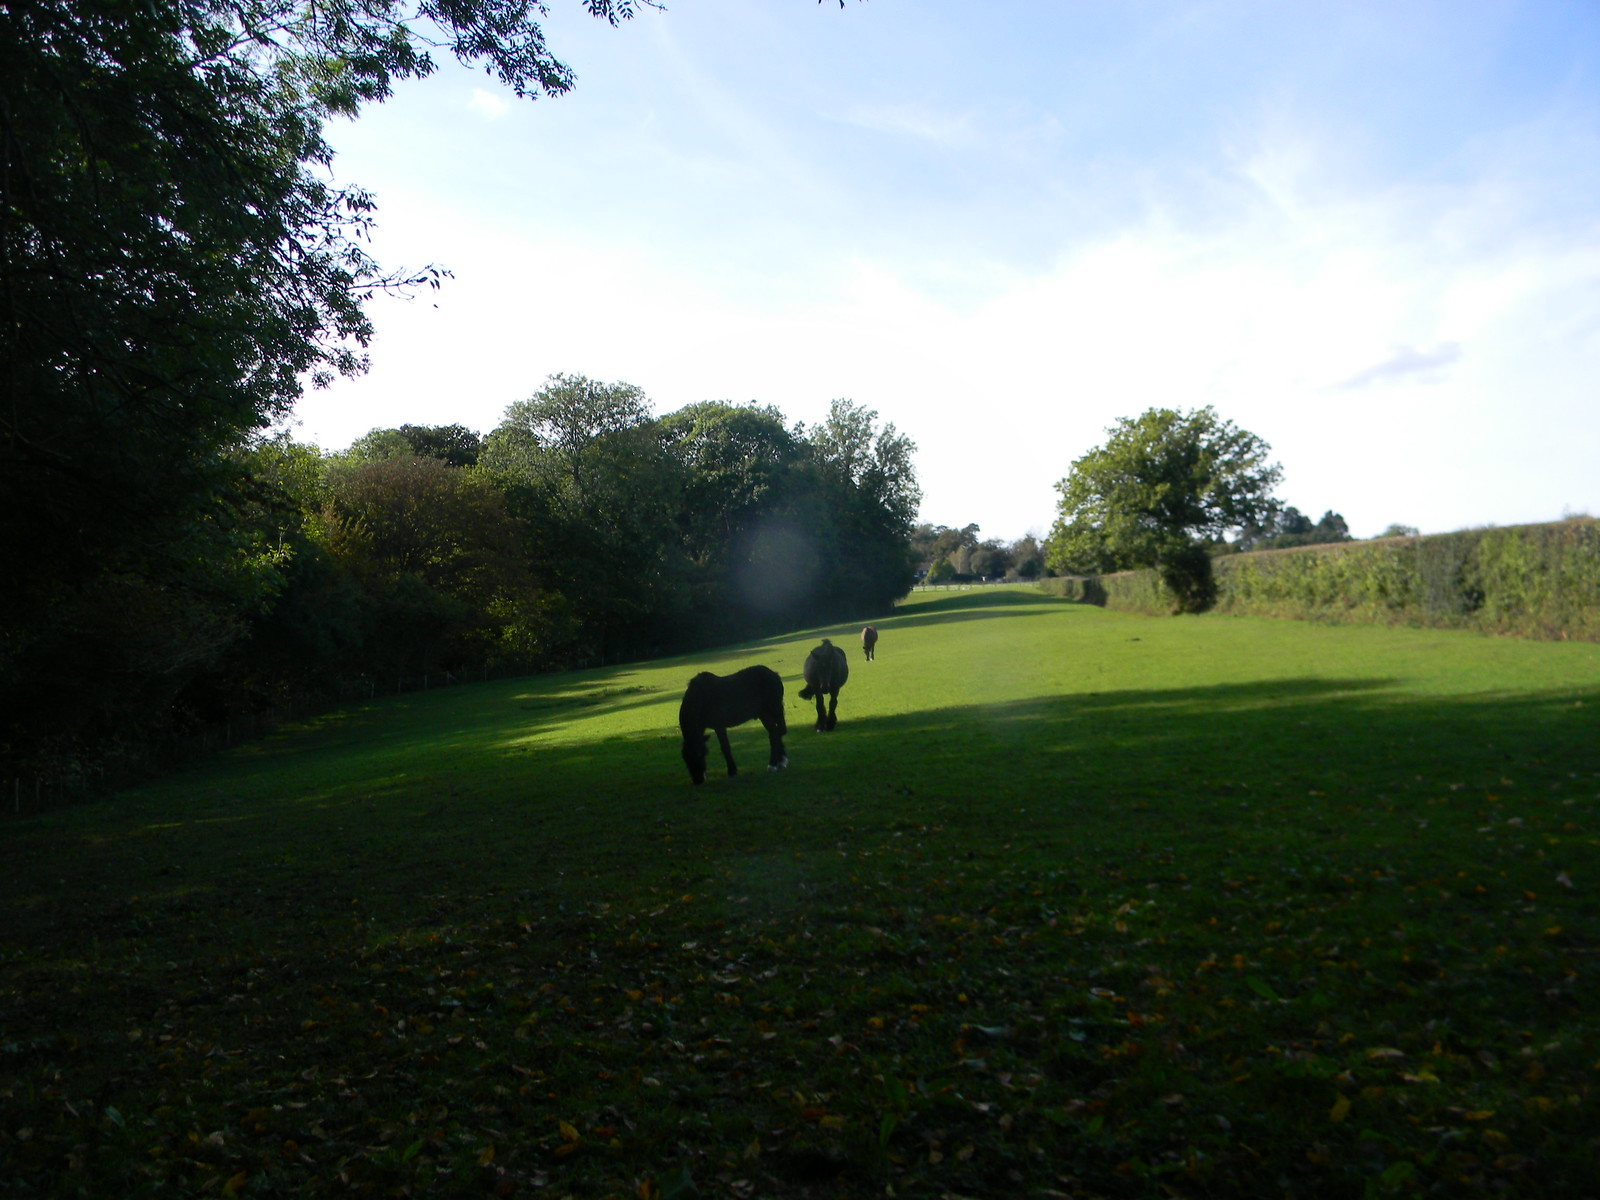 Horses in a field Stonegate Circular